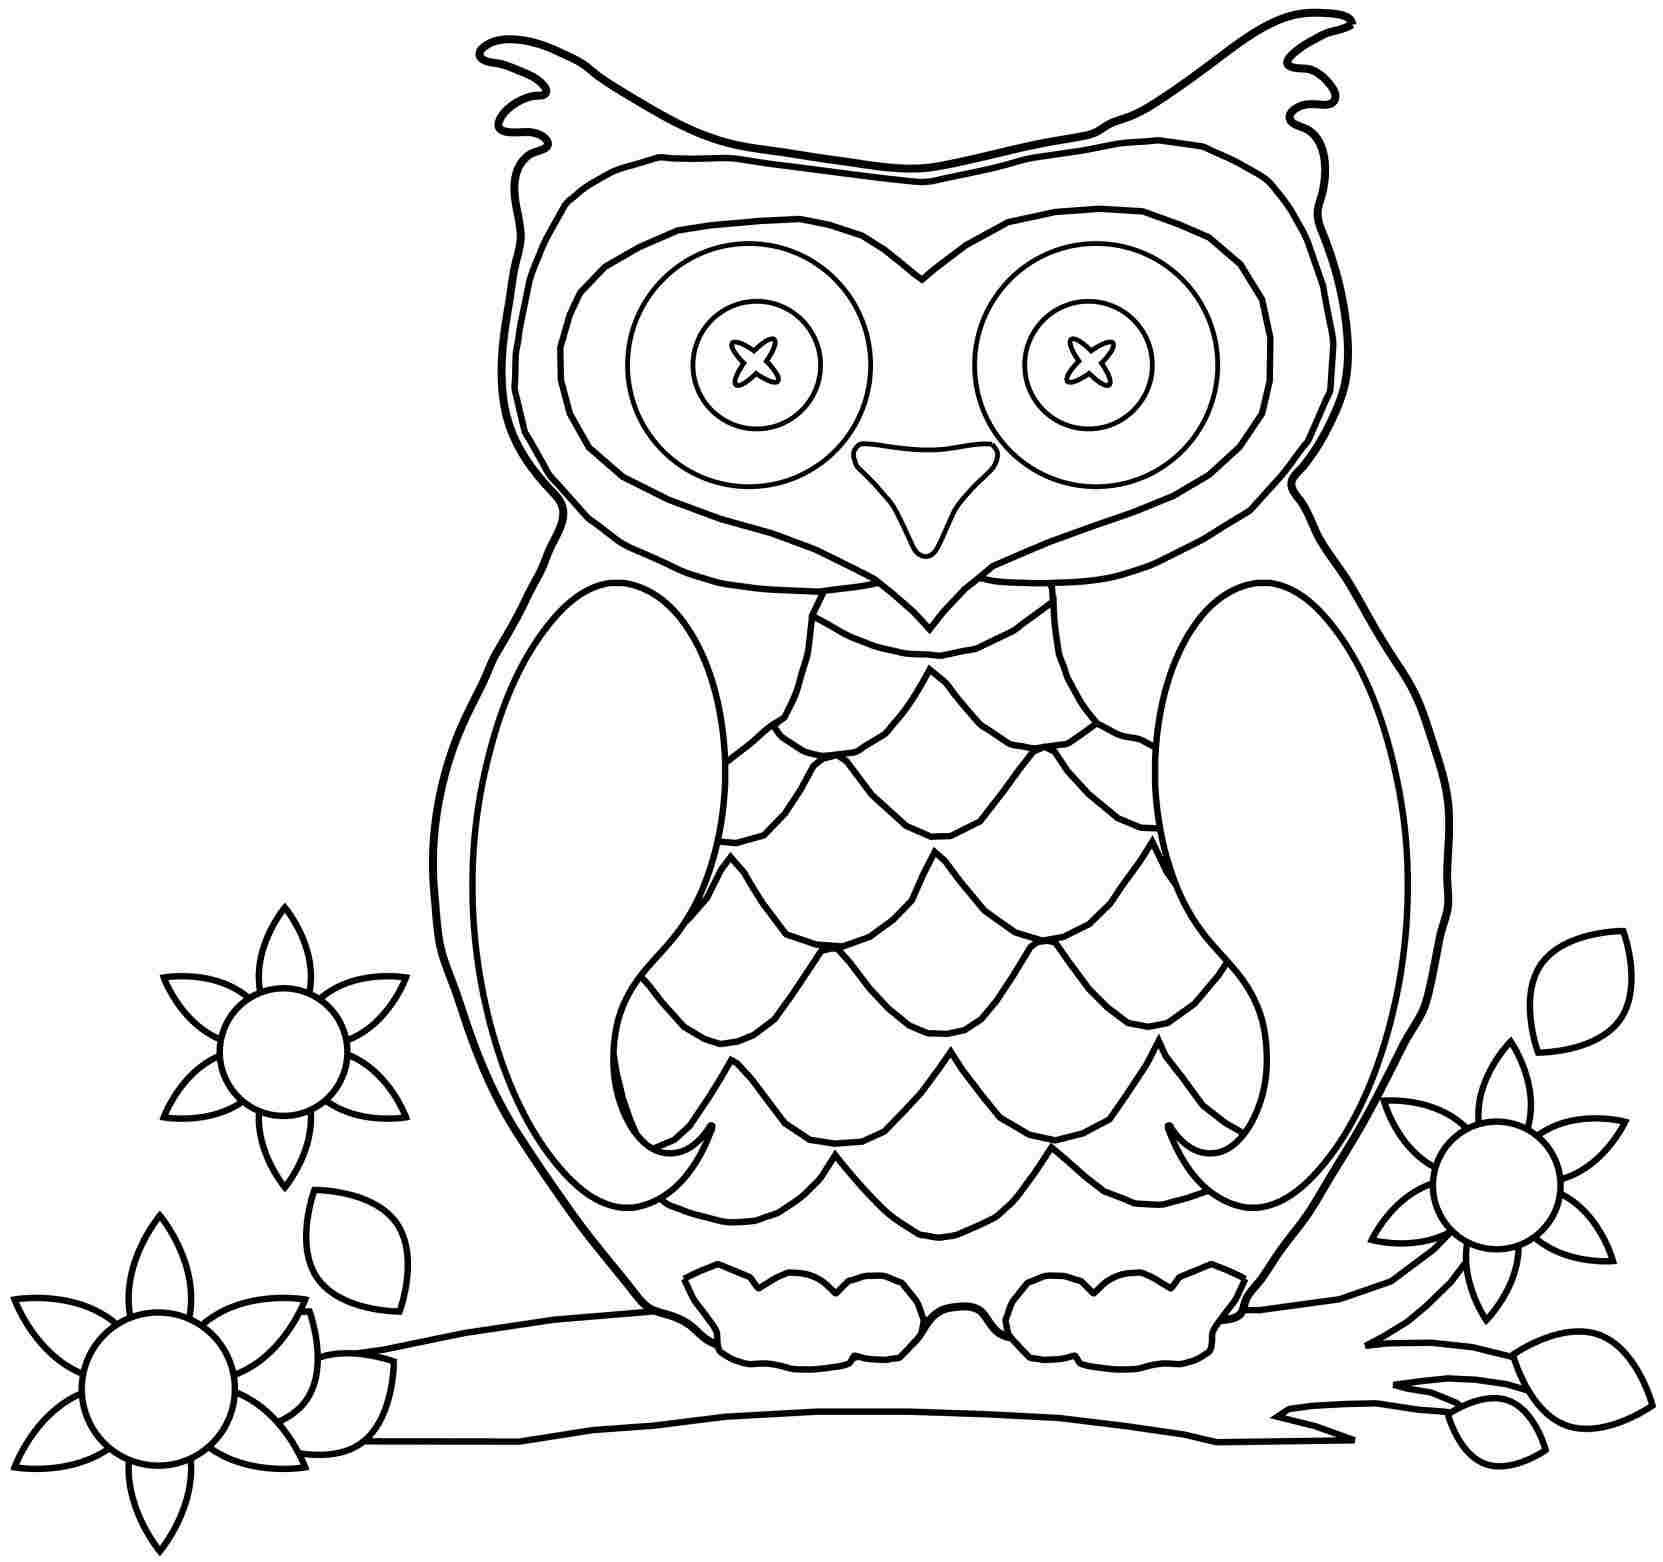 1663x1562 Exclusive Ideas Custom Coloring Pages Owl Pdf Murderthestout